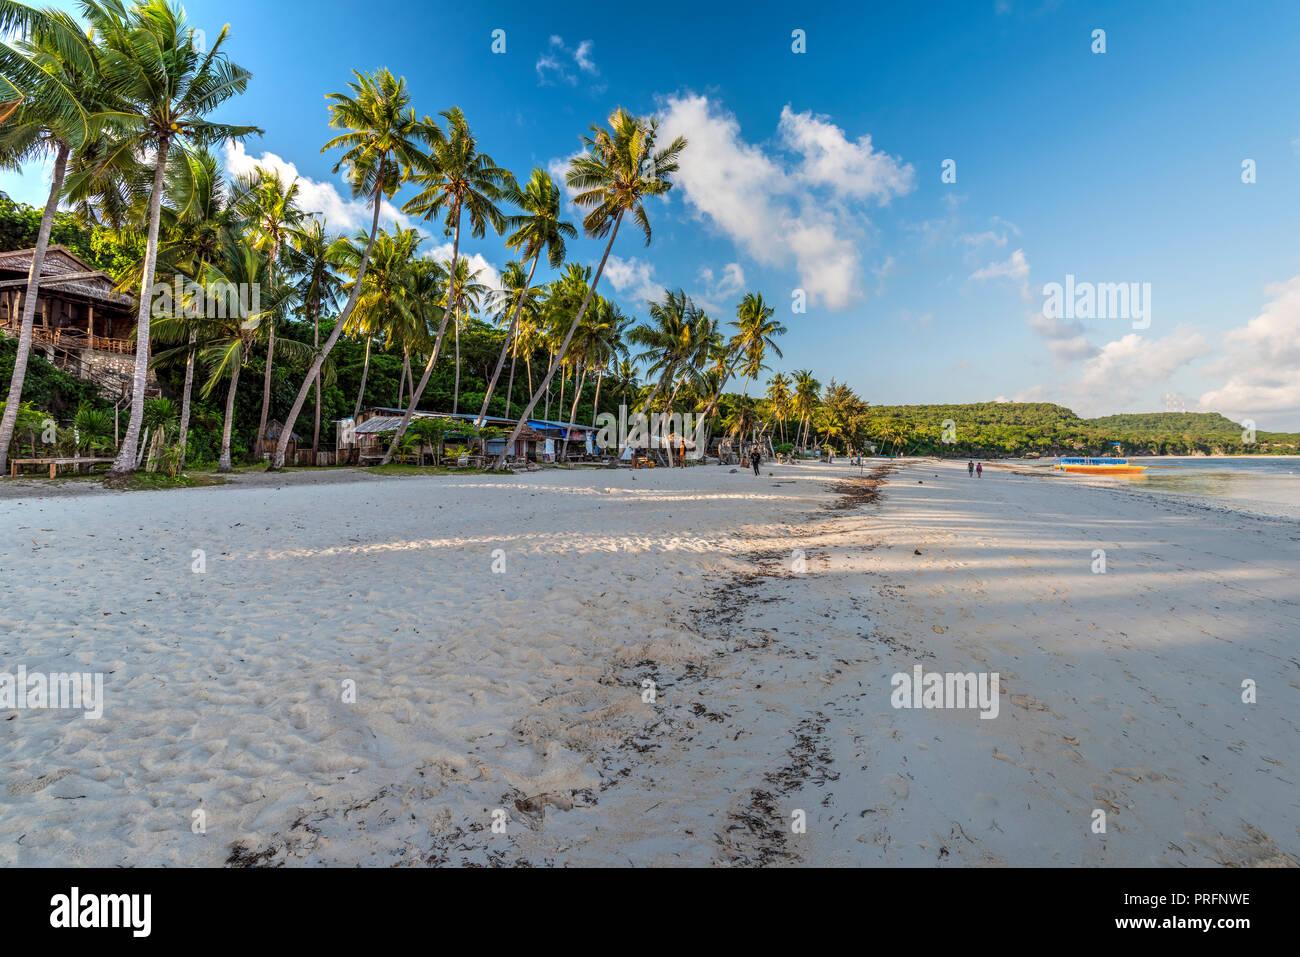 Beach, Bira, Sulawesi, Indonesia - Stock Image